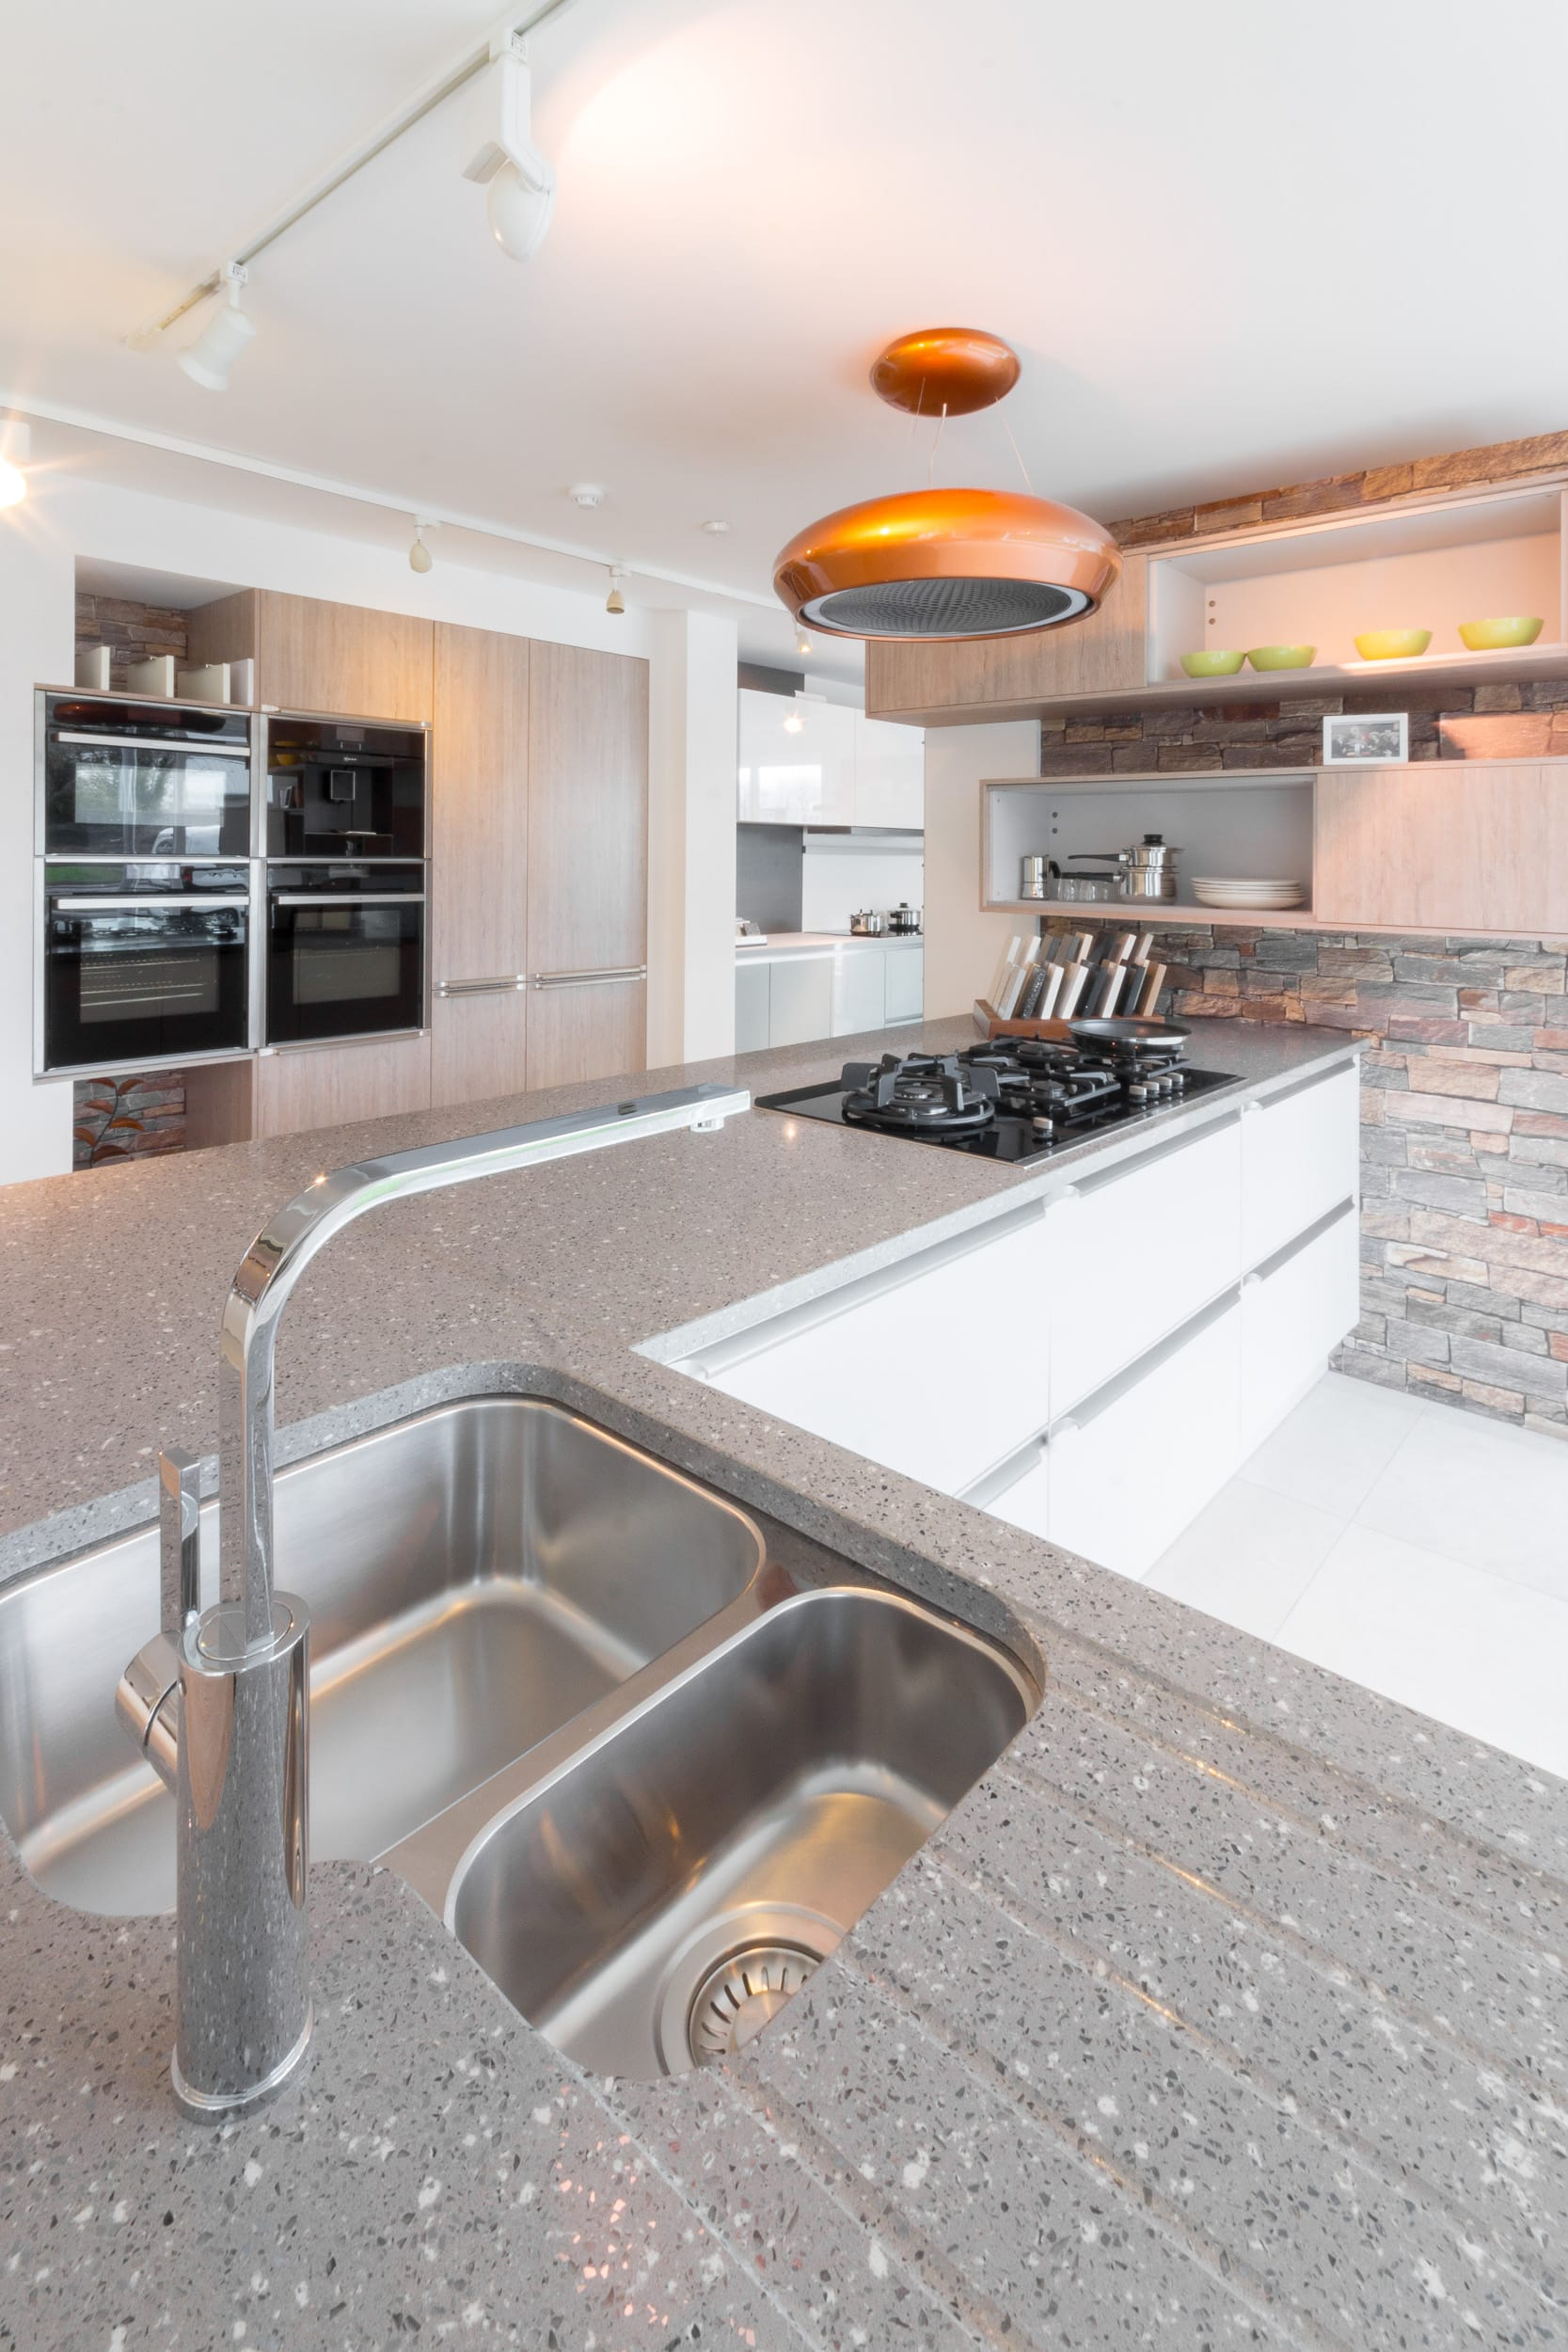 Kitchen-Showroom-Webbs-Kendal-29.jpg